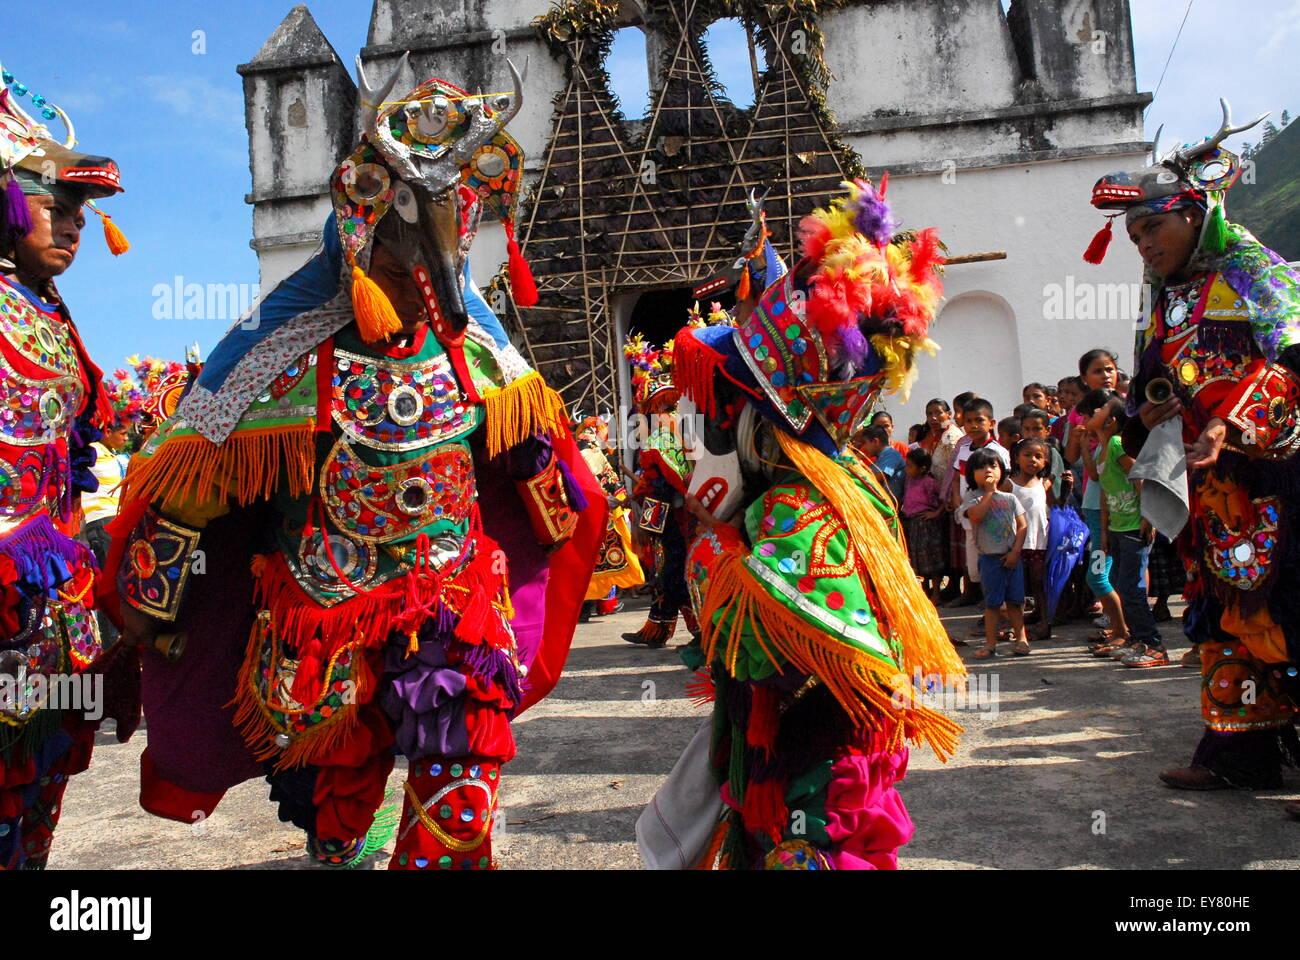 Guatemalan Christmas Parade